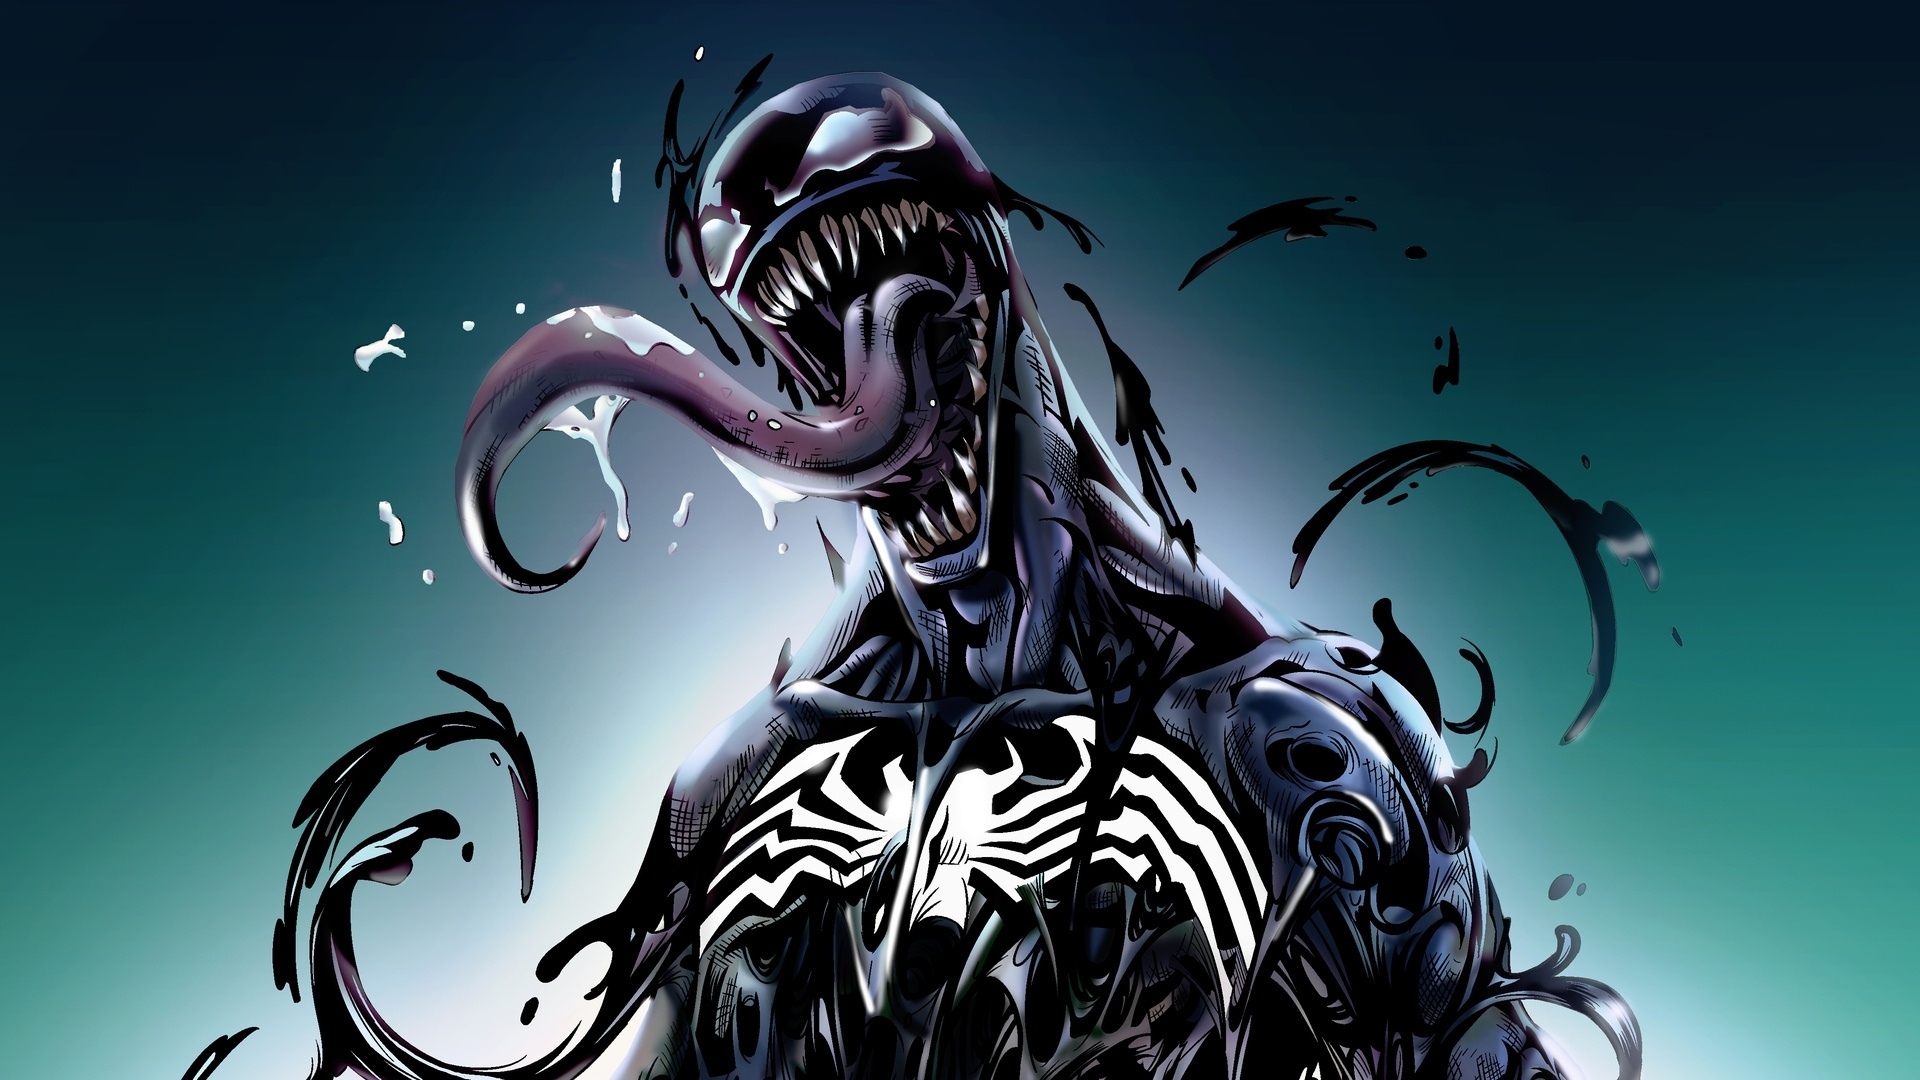 Venom laptop wallpaper